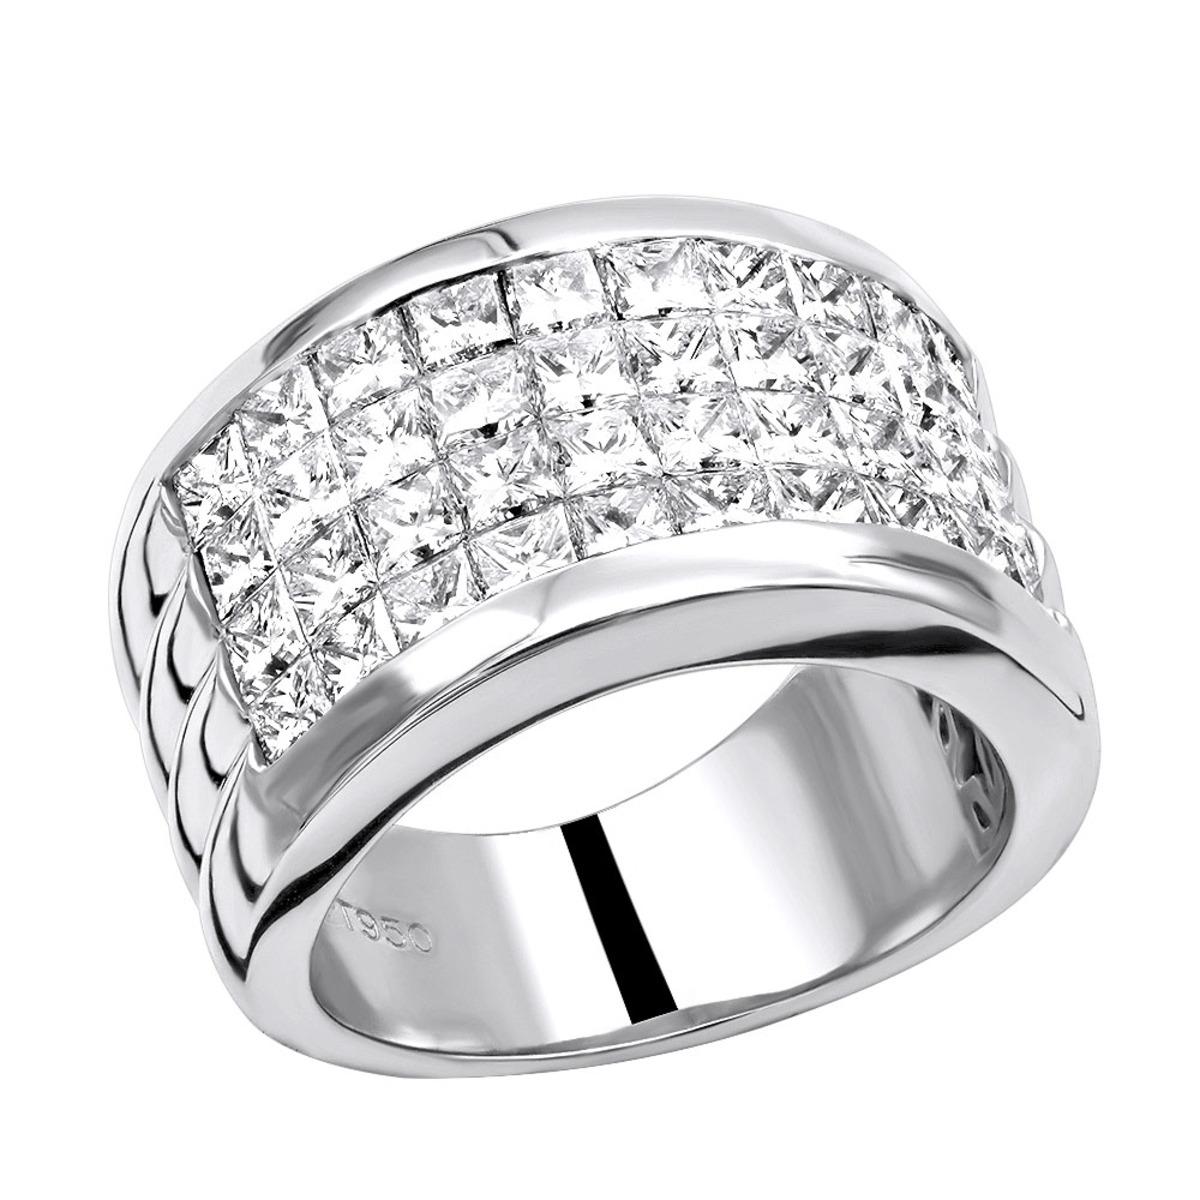 5 Carat G VS Invisible Set Princess Cut Diamond Wedding Band in Platinum